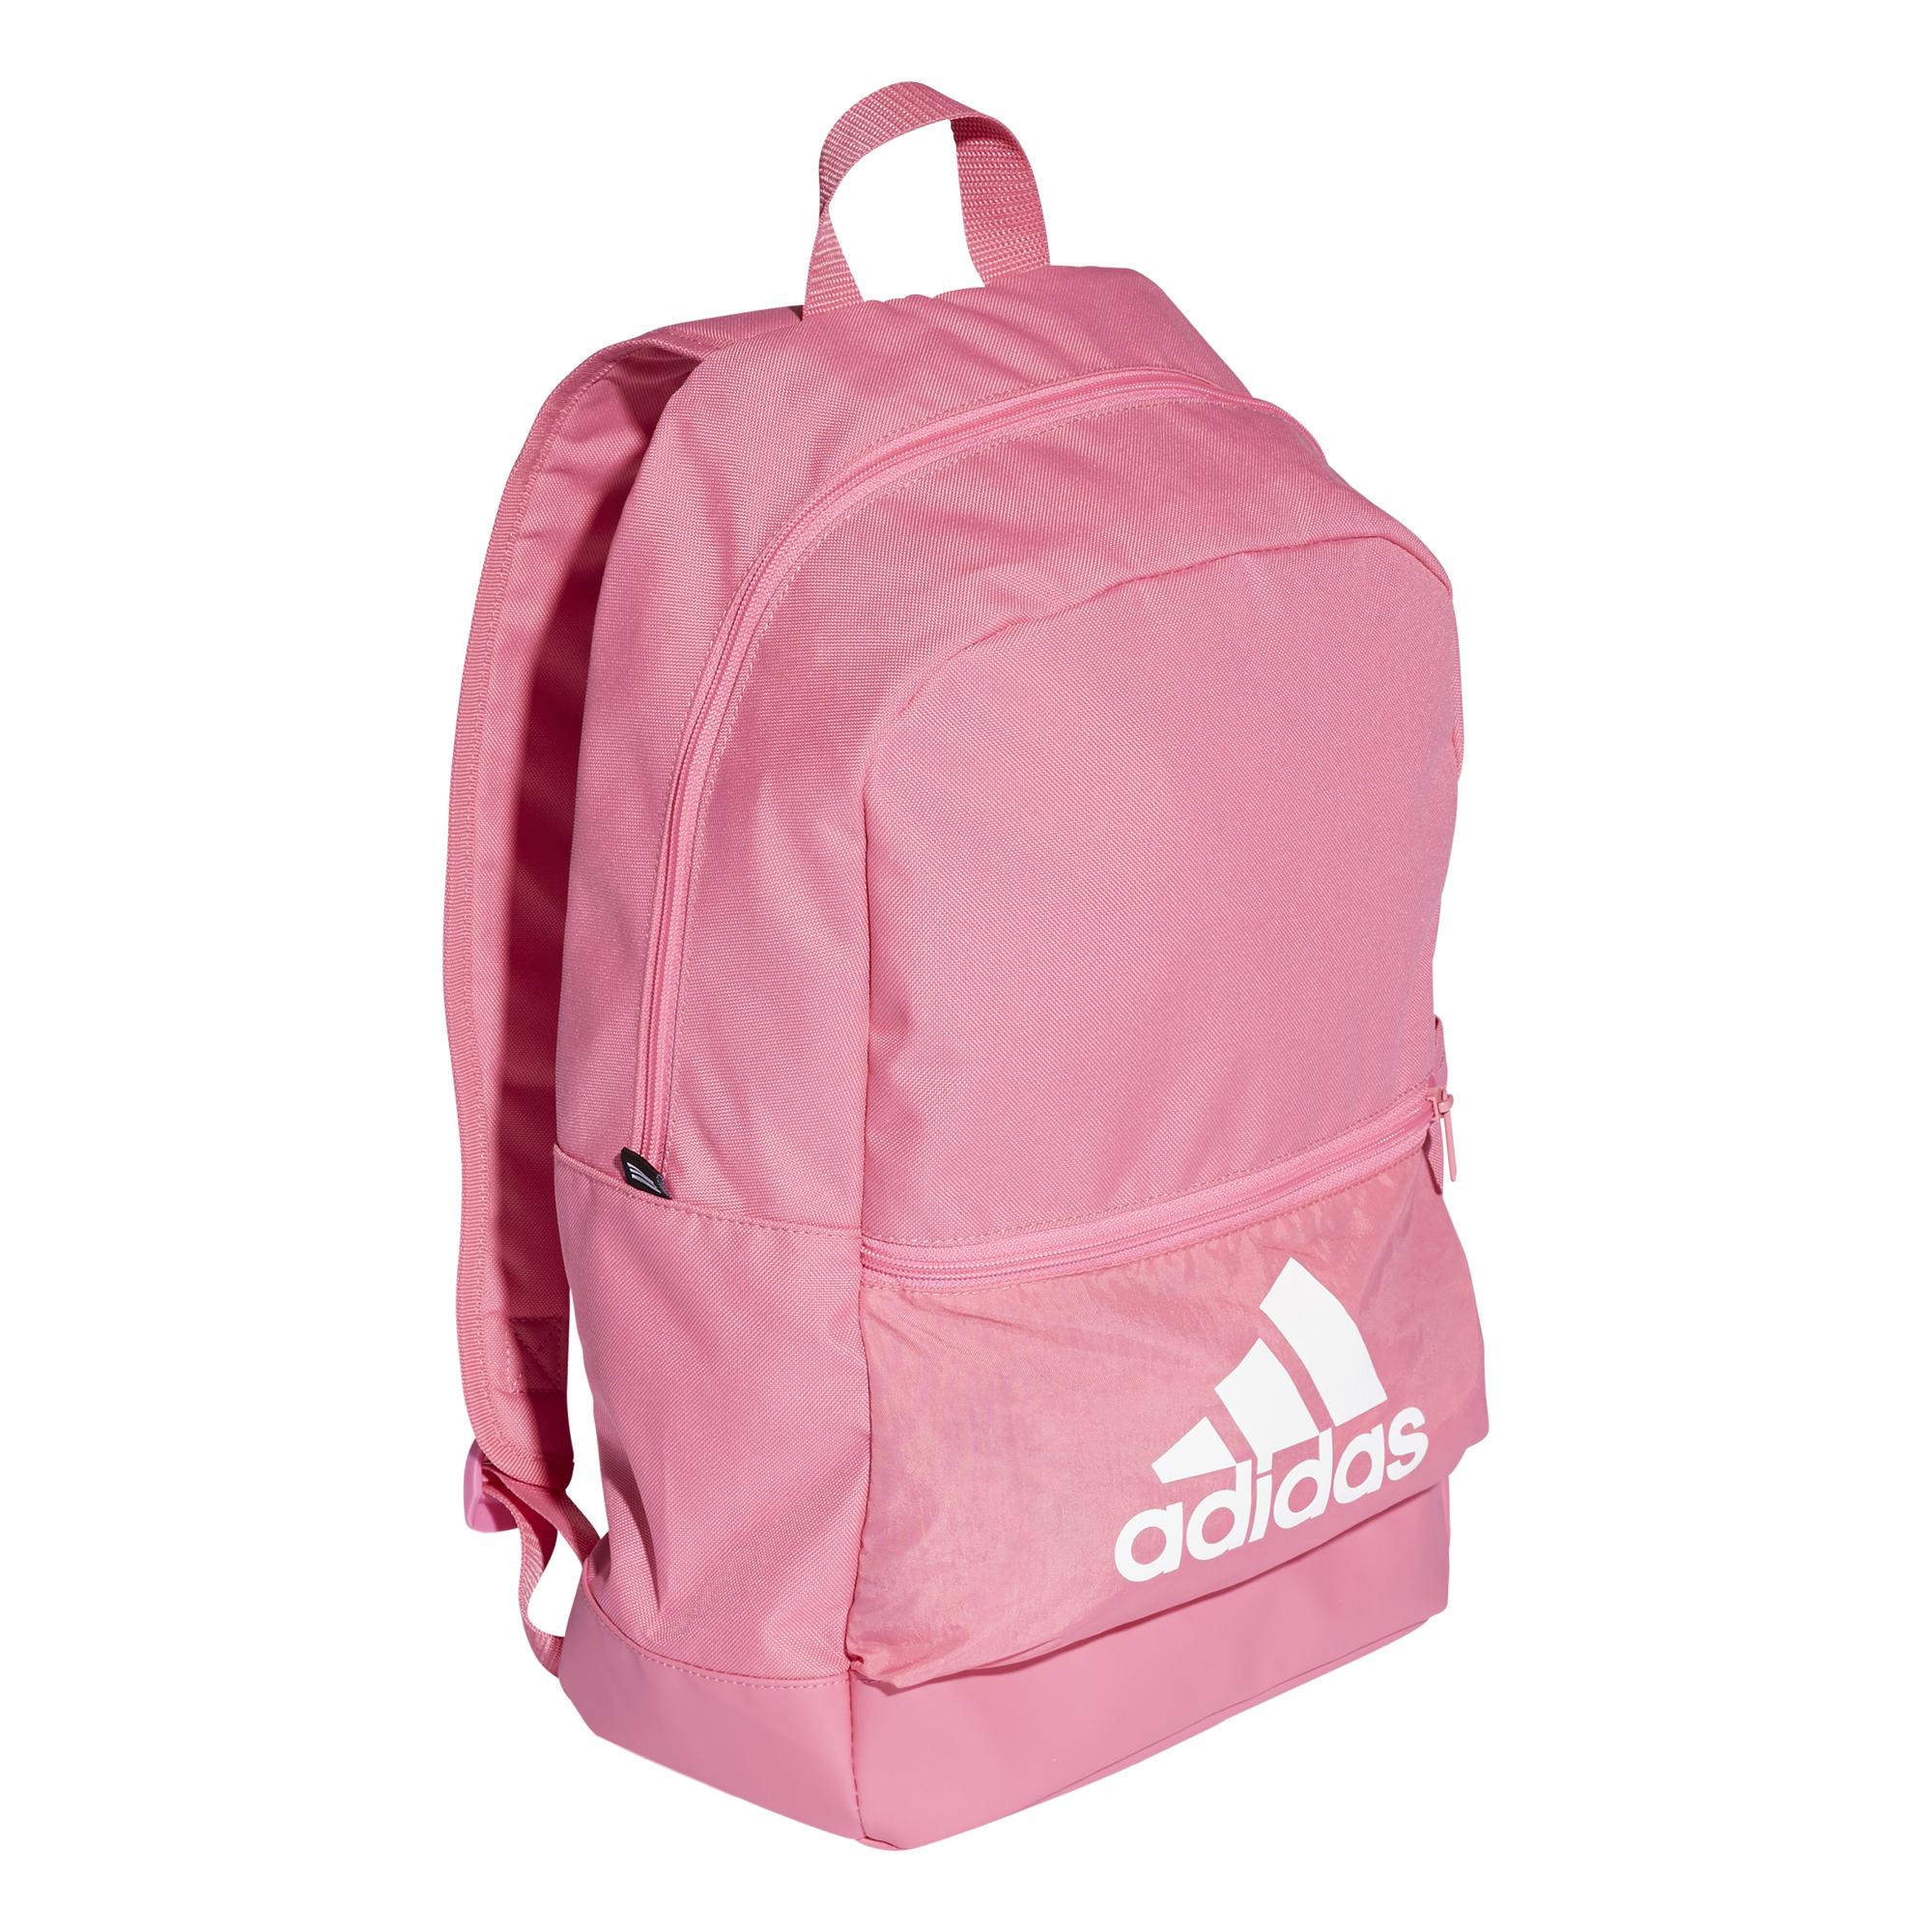 6895a42c7b62e plecak adidas Classic Backpack Bos DT2630 || timsport.pl - dodatkowe ...